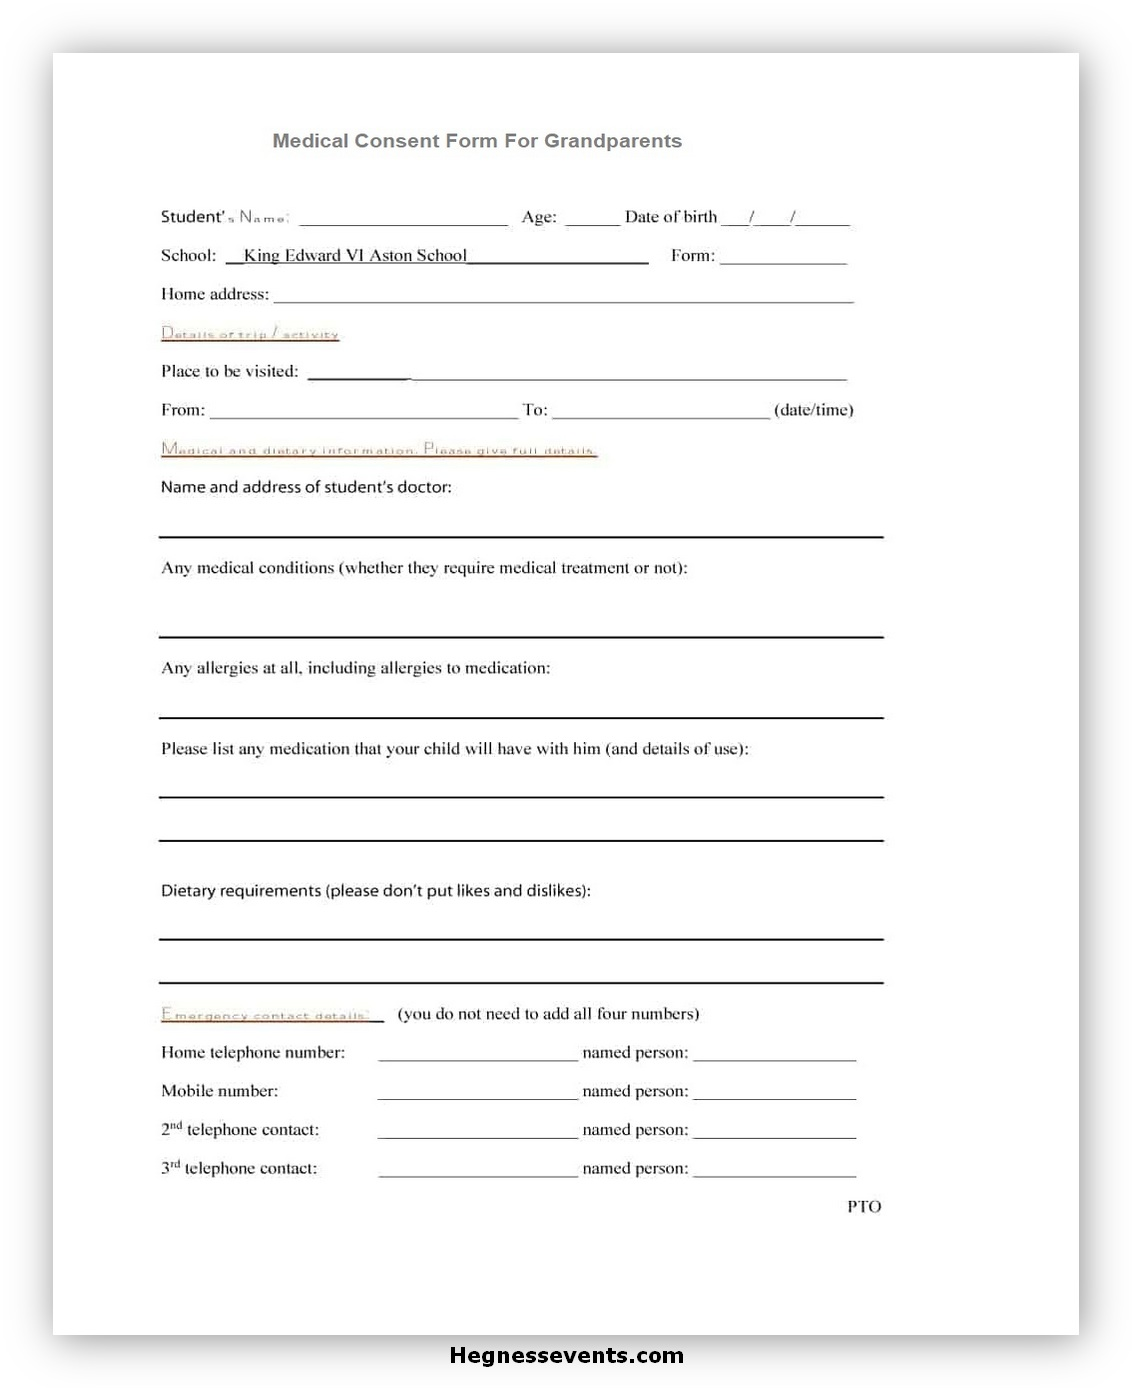 Medical Consent Form for Grandparents 01